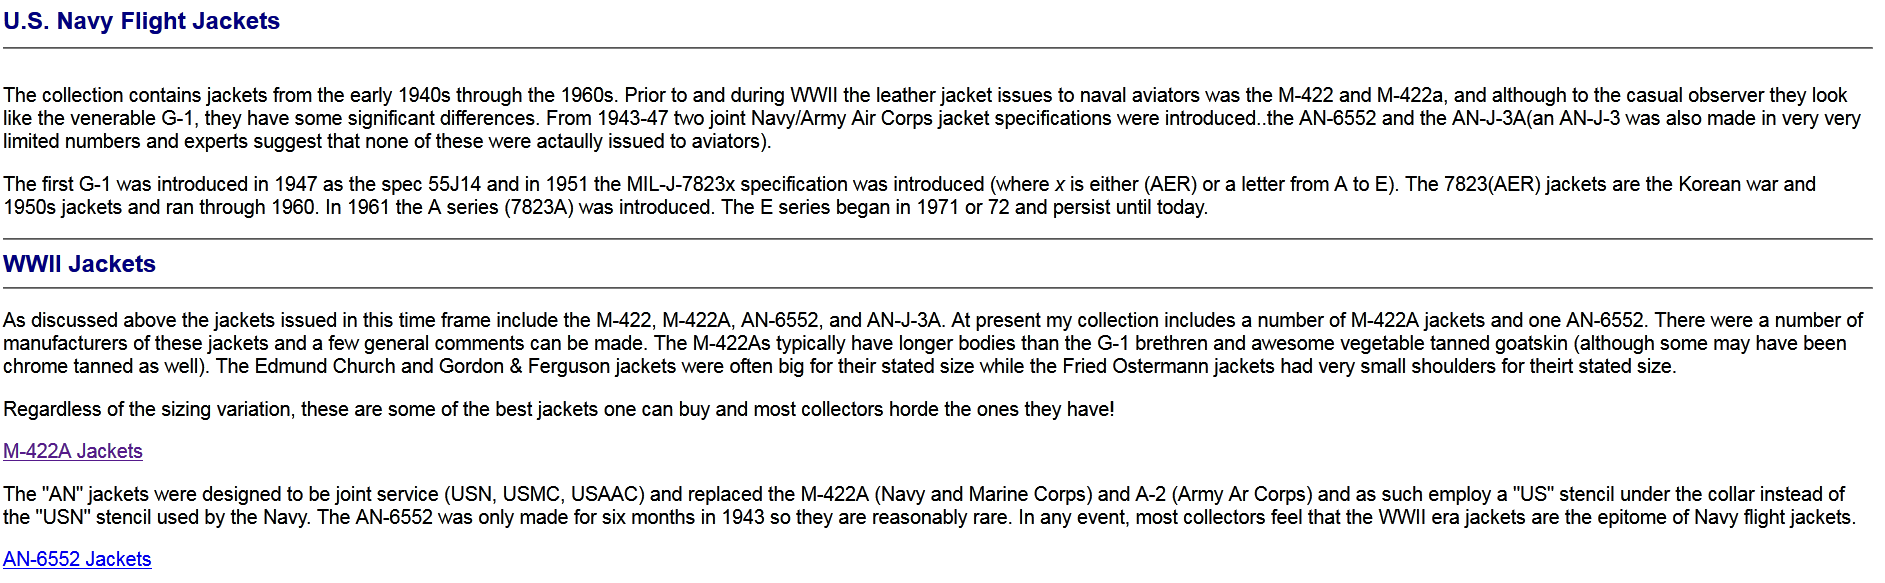 Screenshot_2019-12-23 Navy Flight Jackets (2).png